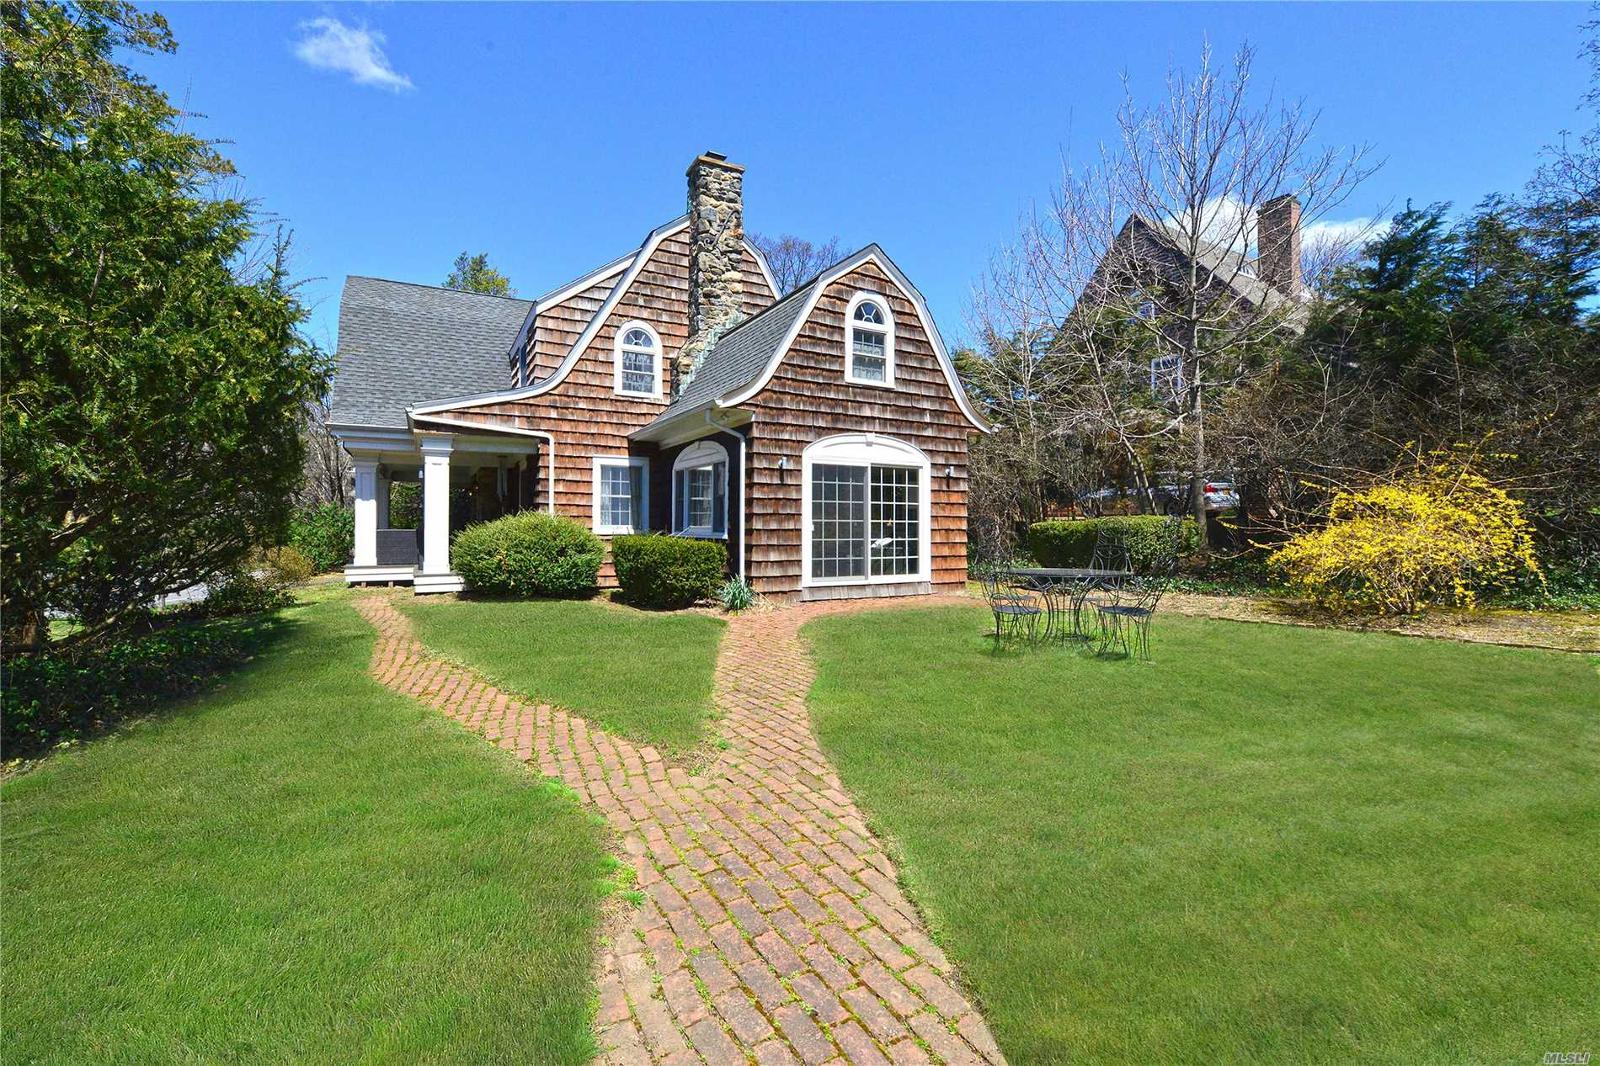 119 Cherry Valley Ave, Garden City, NY — MLS# 3023650 — Better Homes ...